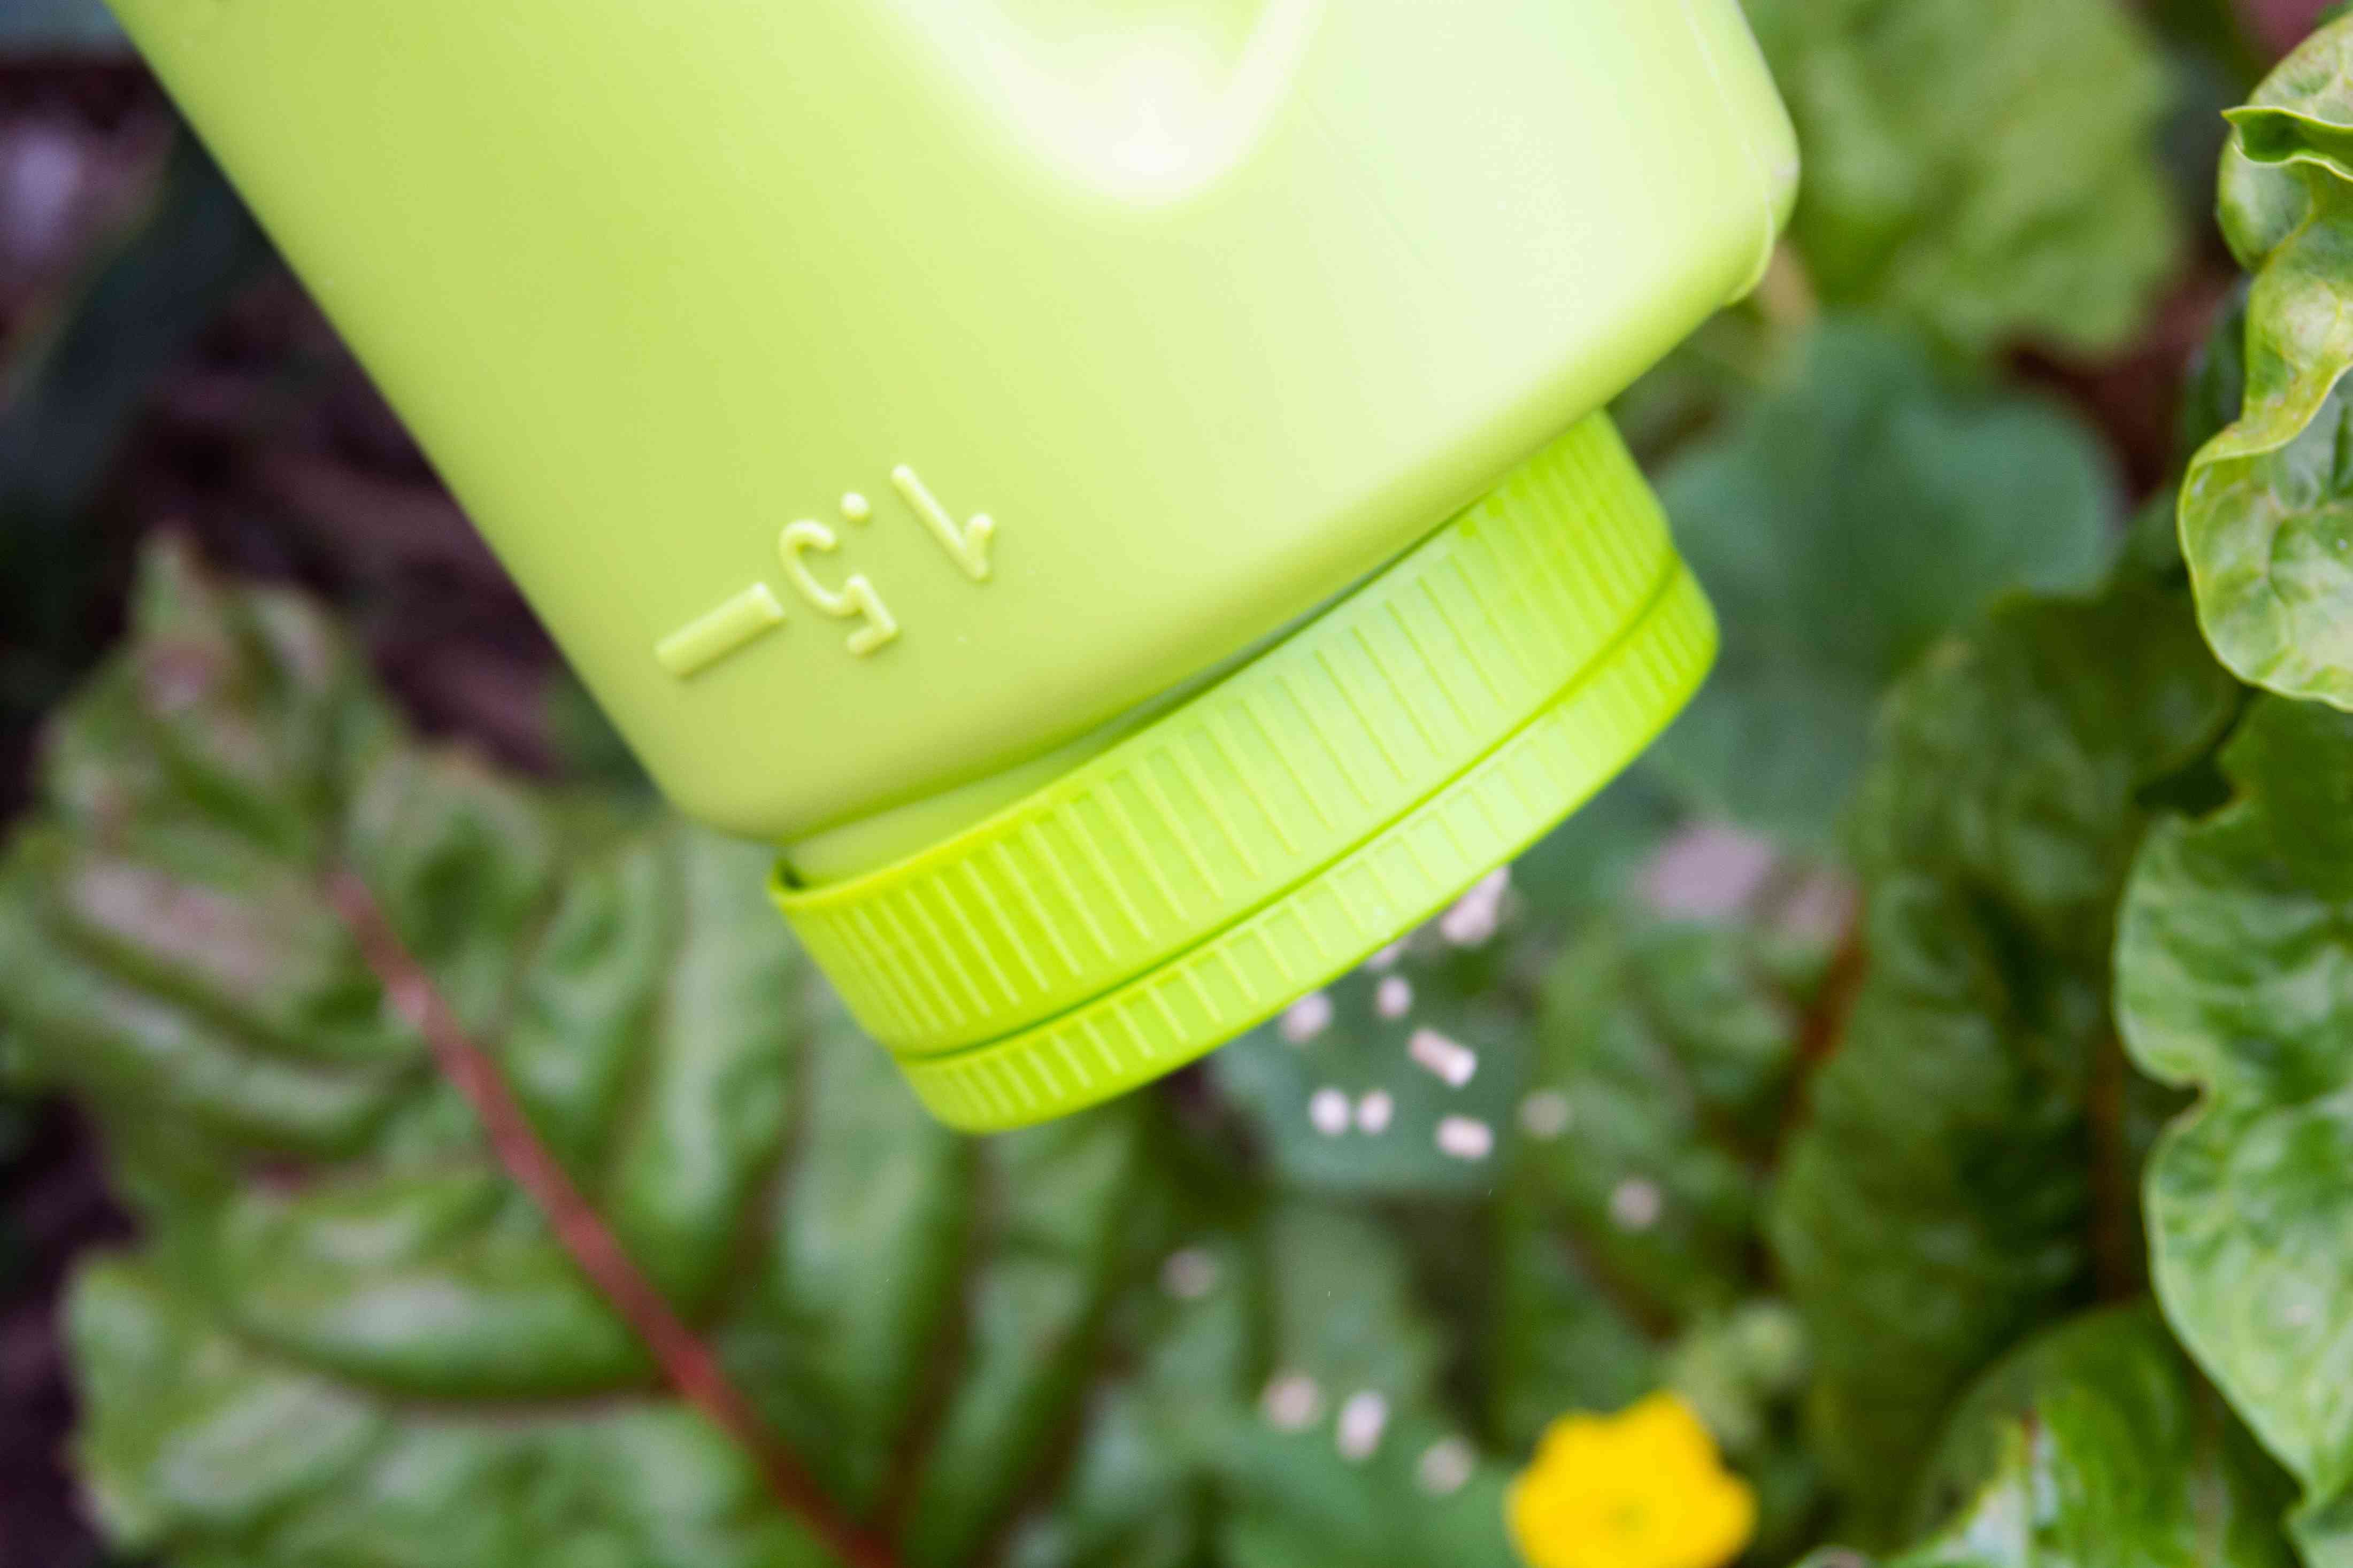 Diatomaceous earth pellets poured into garden to prevent slugs